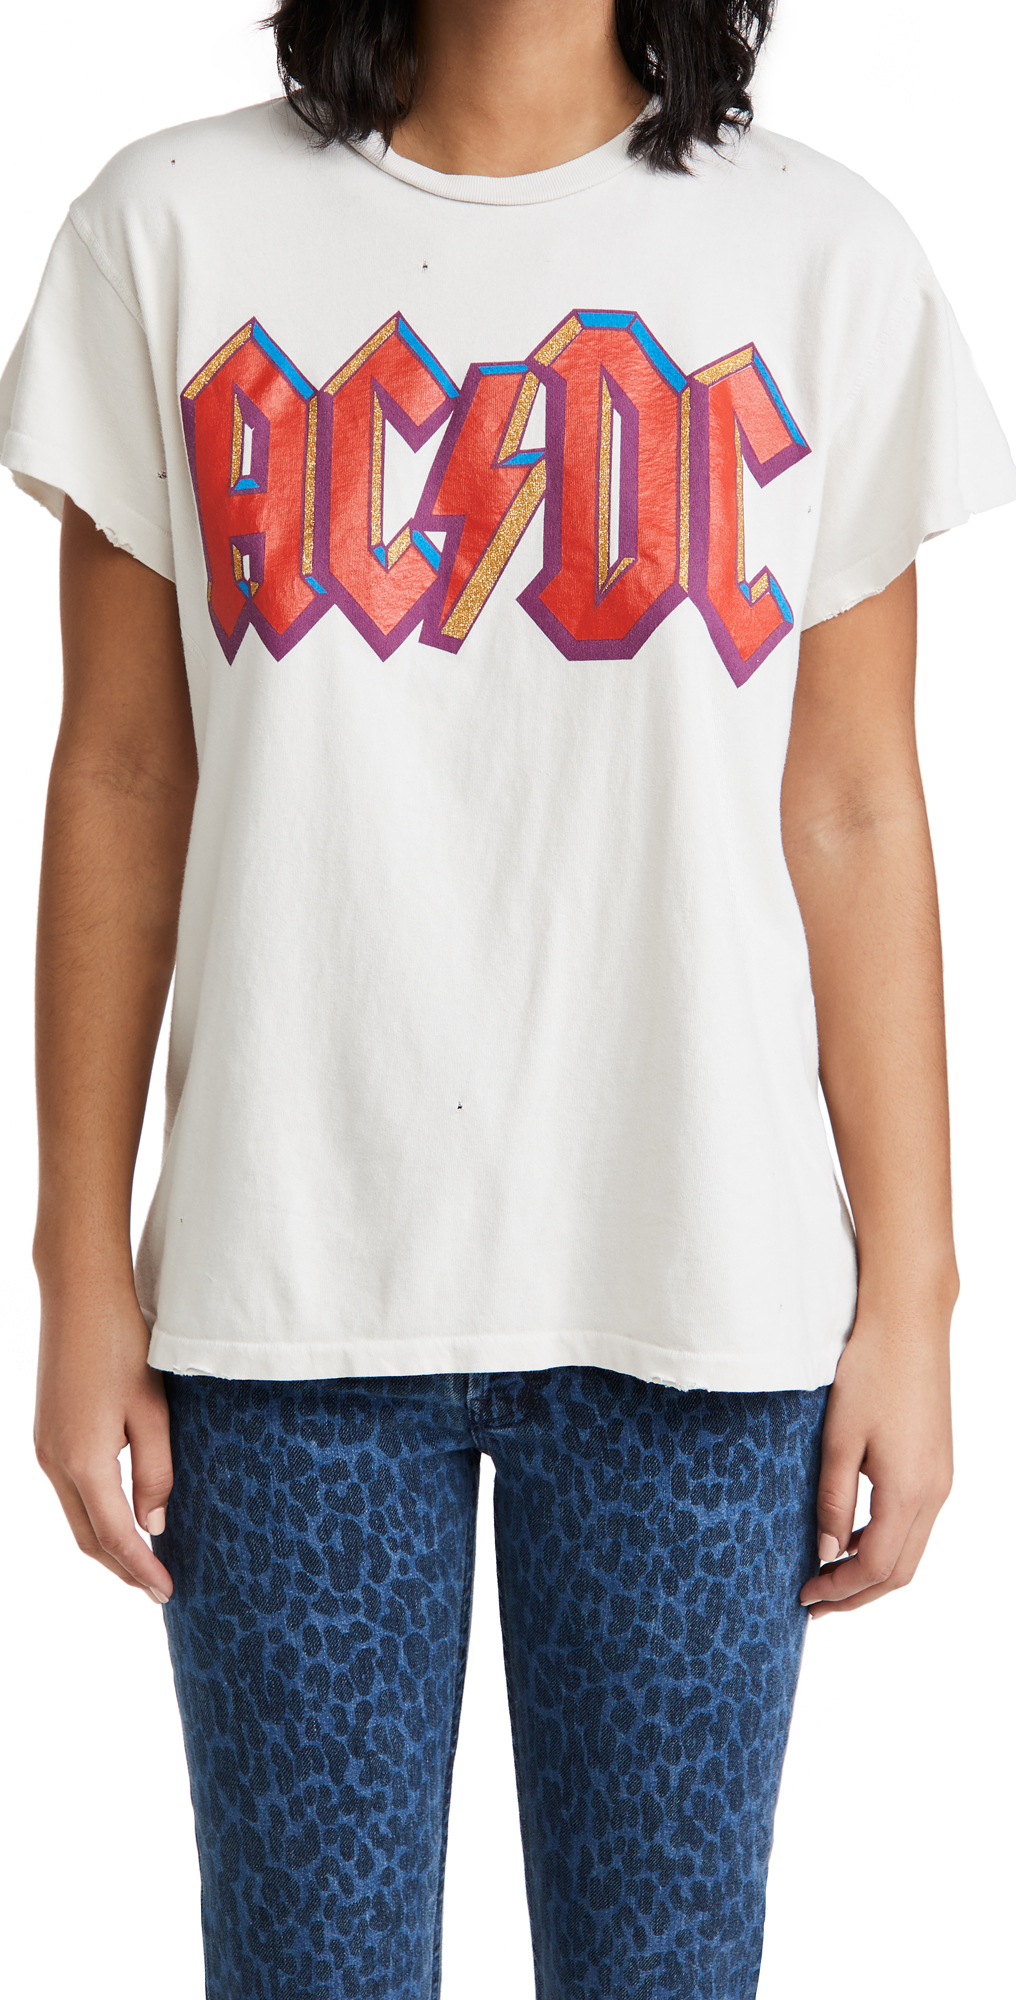 MADEWORN ROCK AC/DC Tee